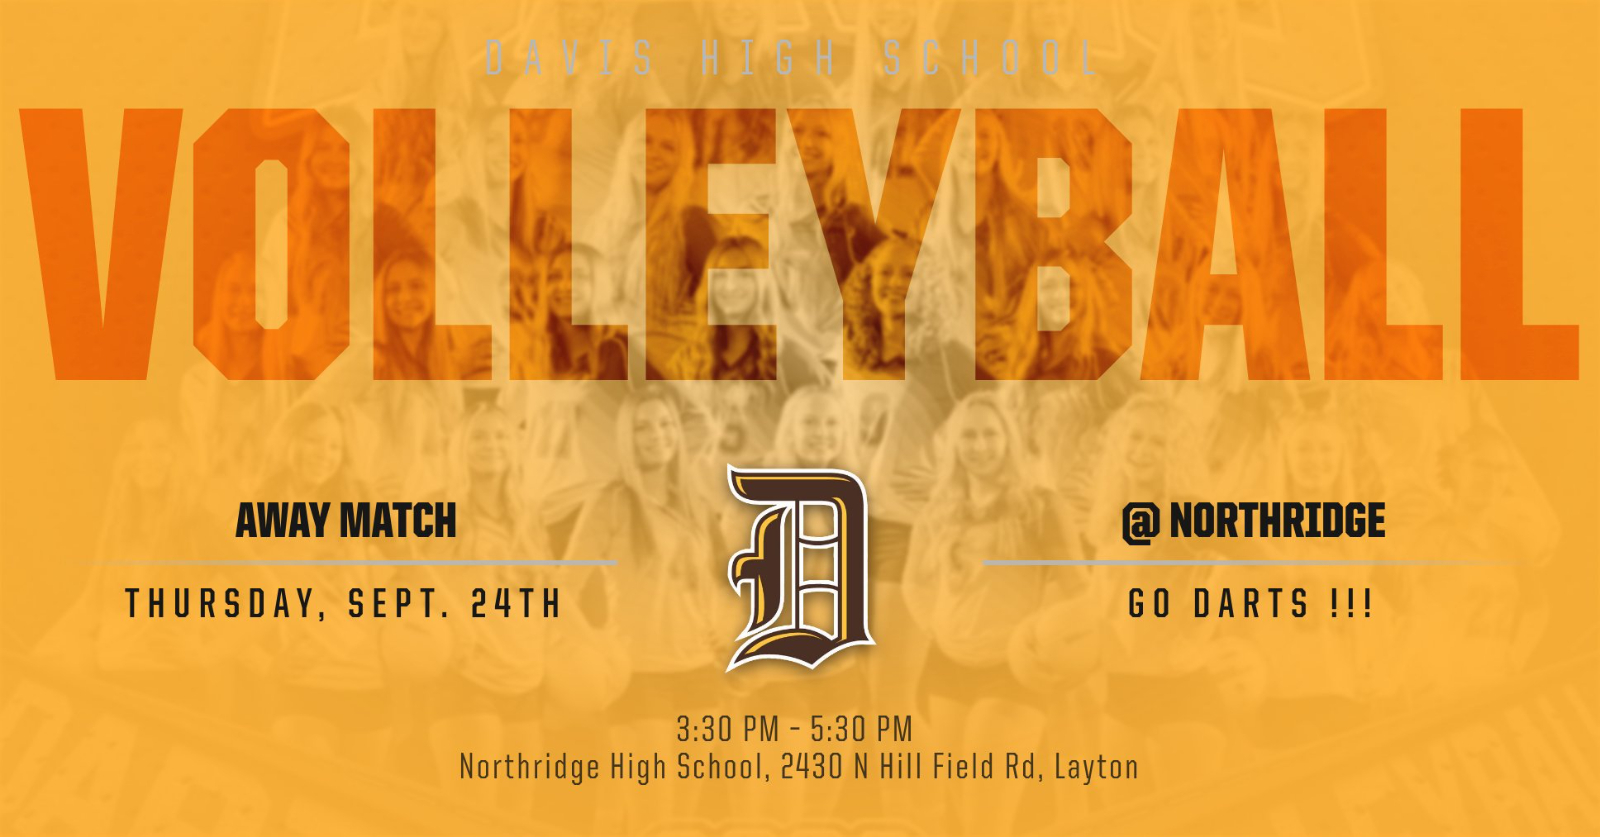 Volleyball @ Northridge Today